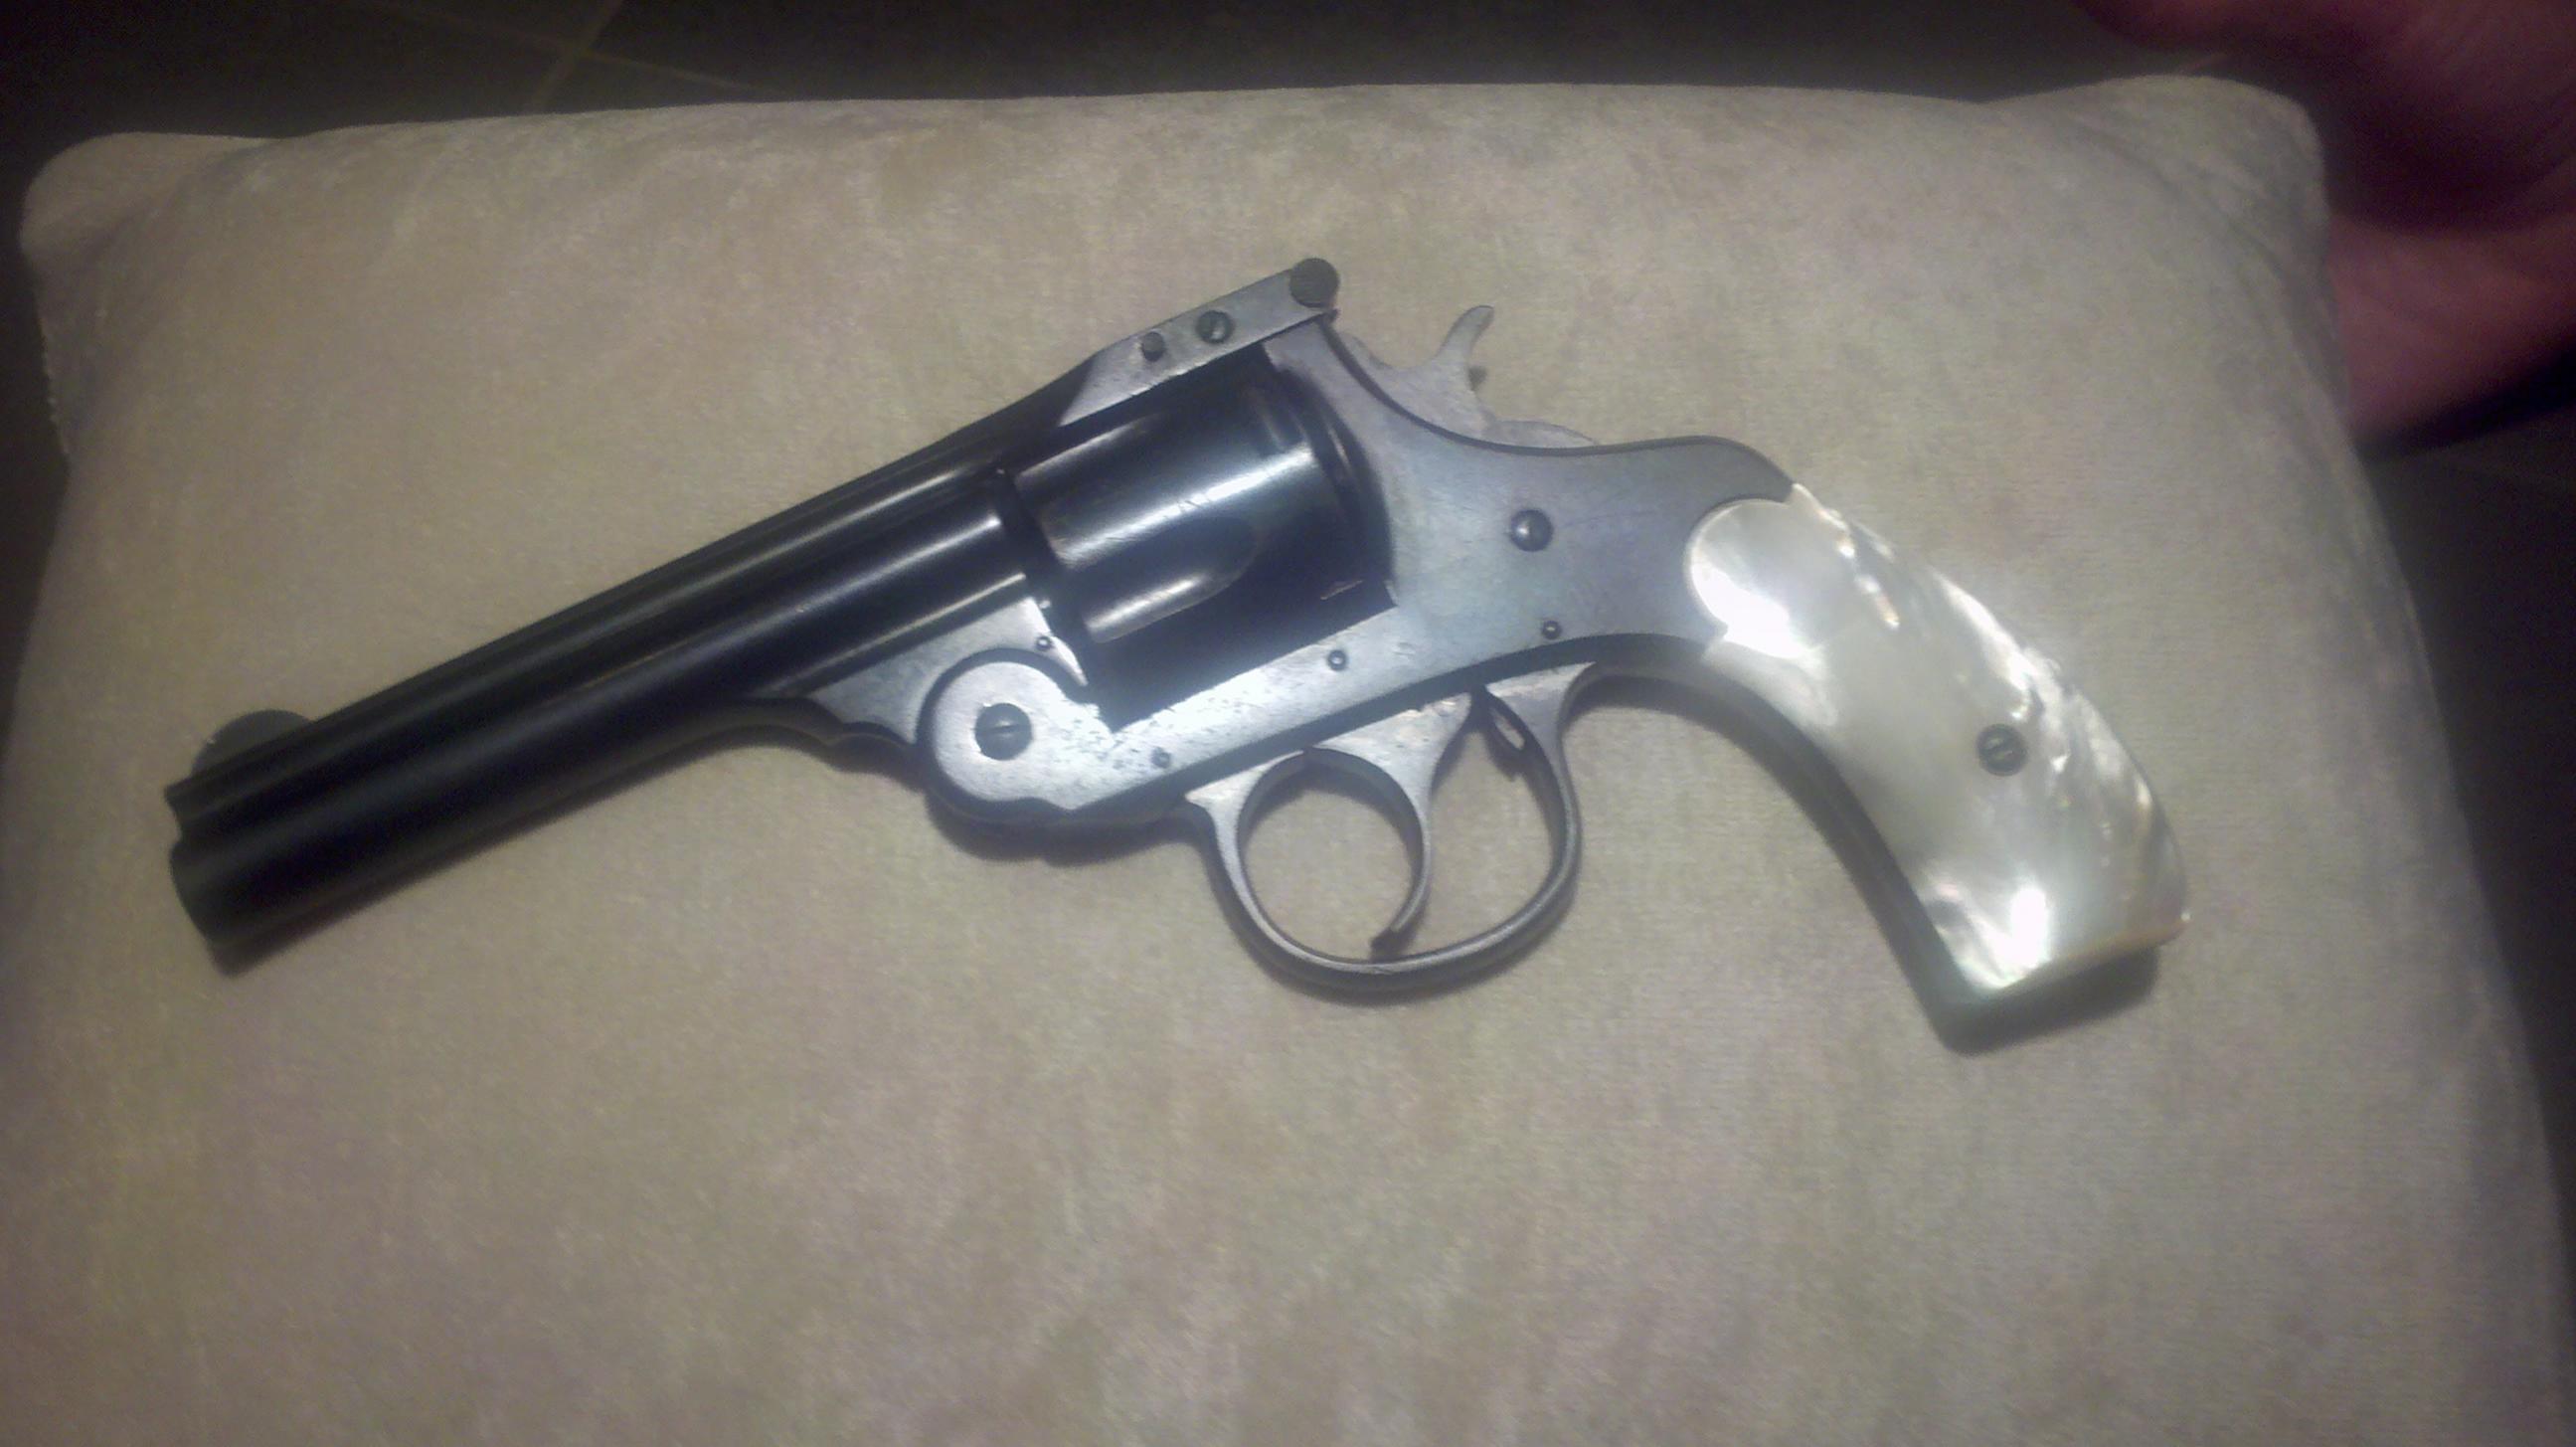 Can anyone help me identify this gun?-2011-01-30_20-30-24_280.jpg